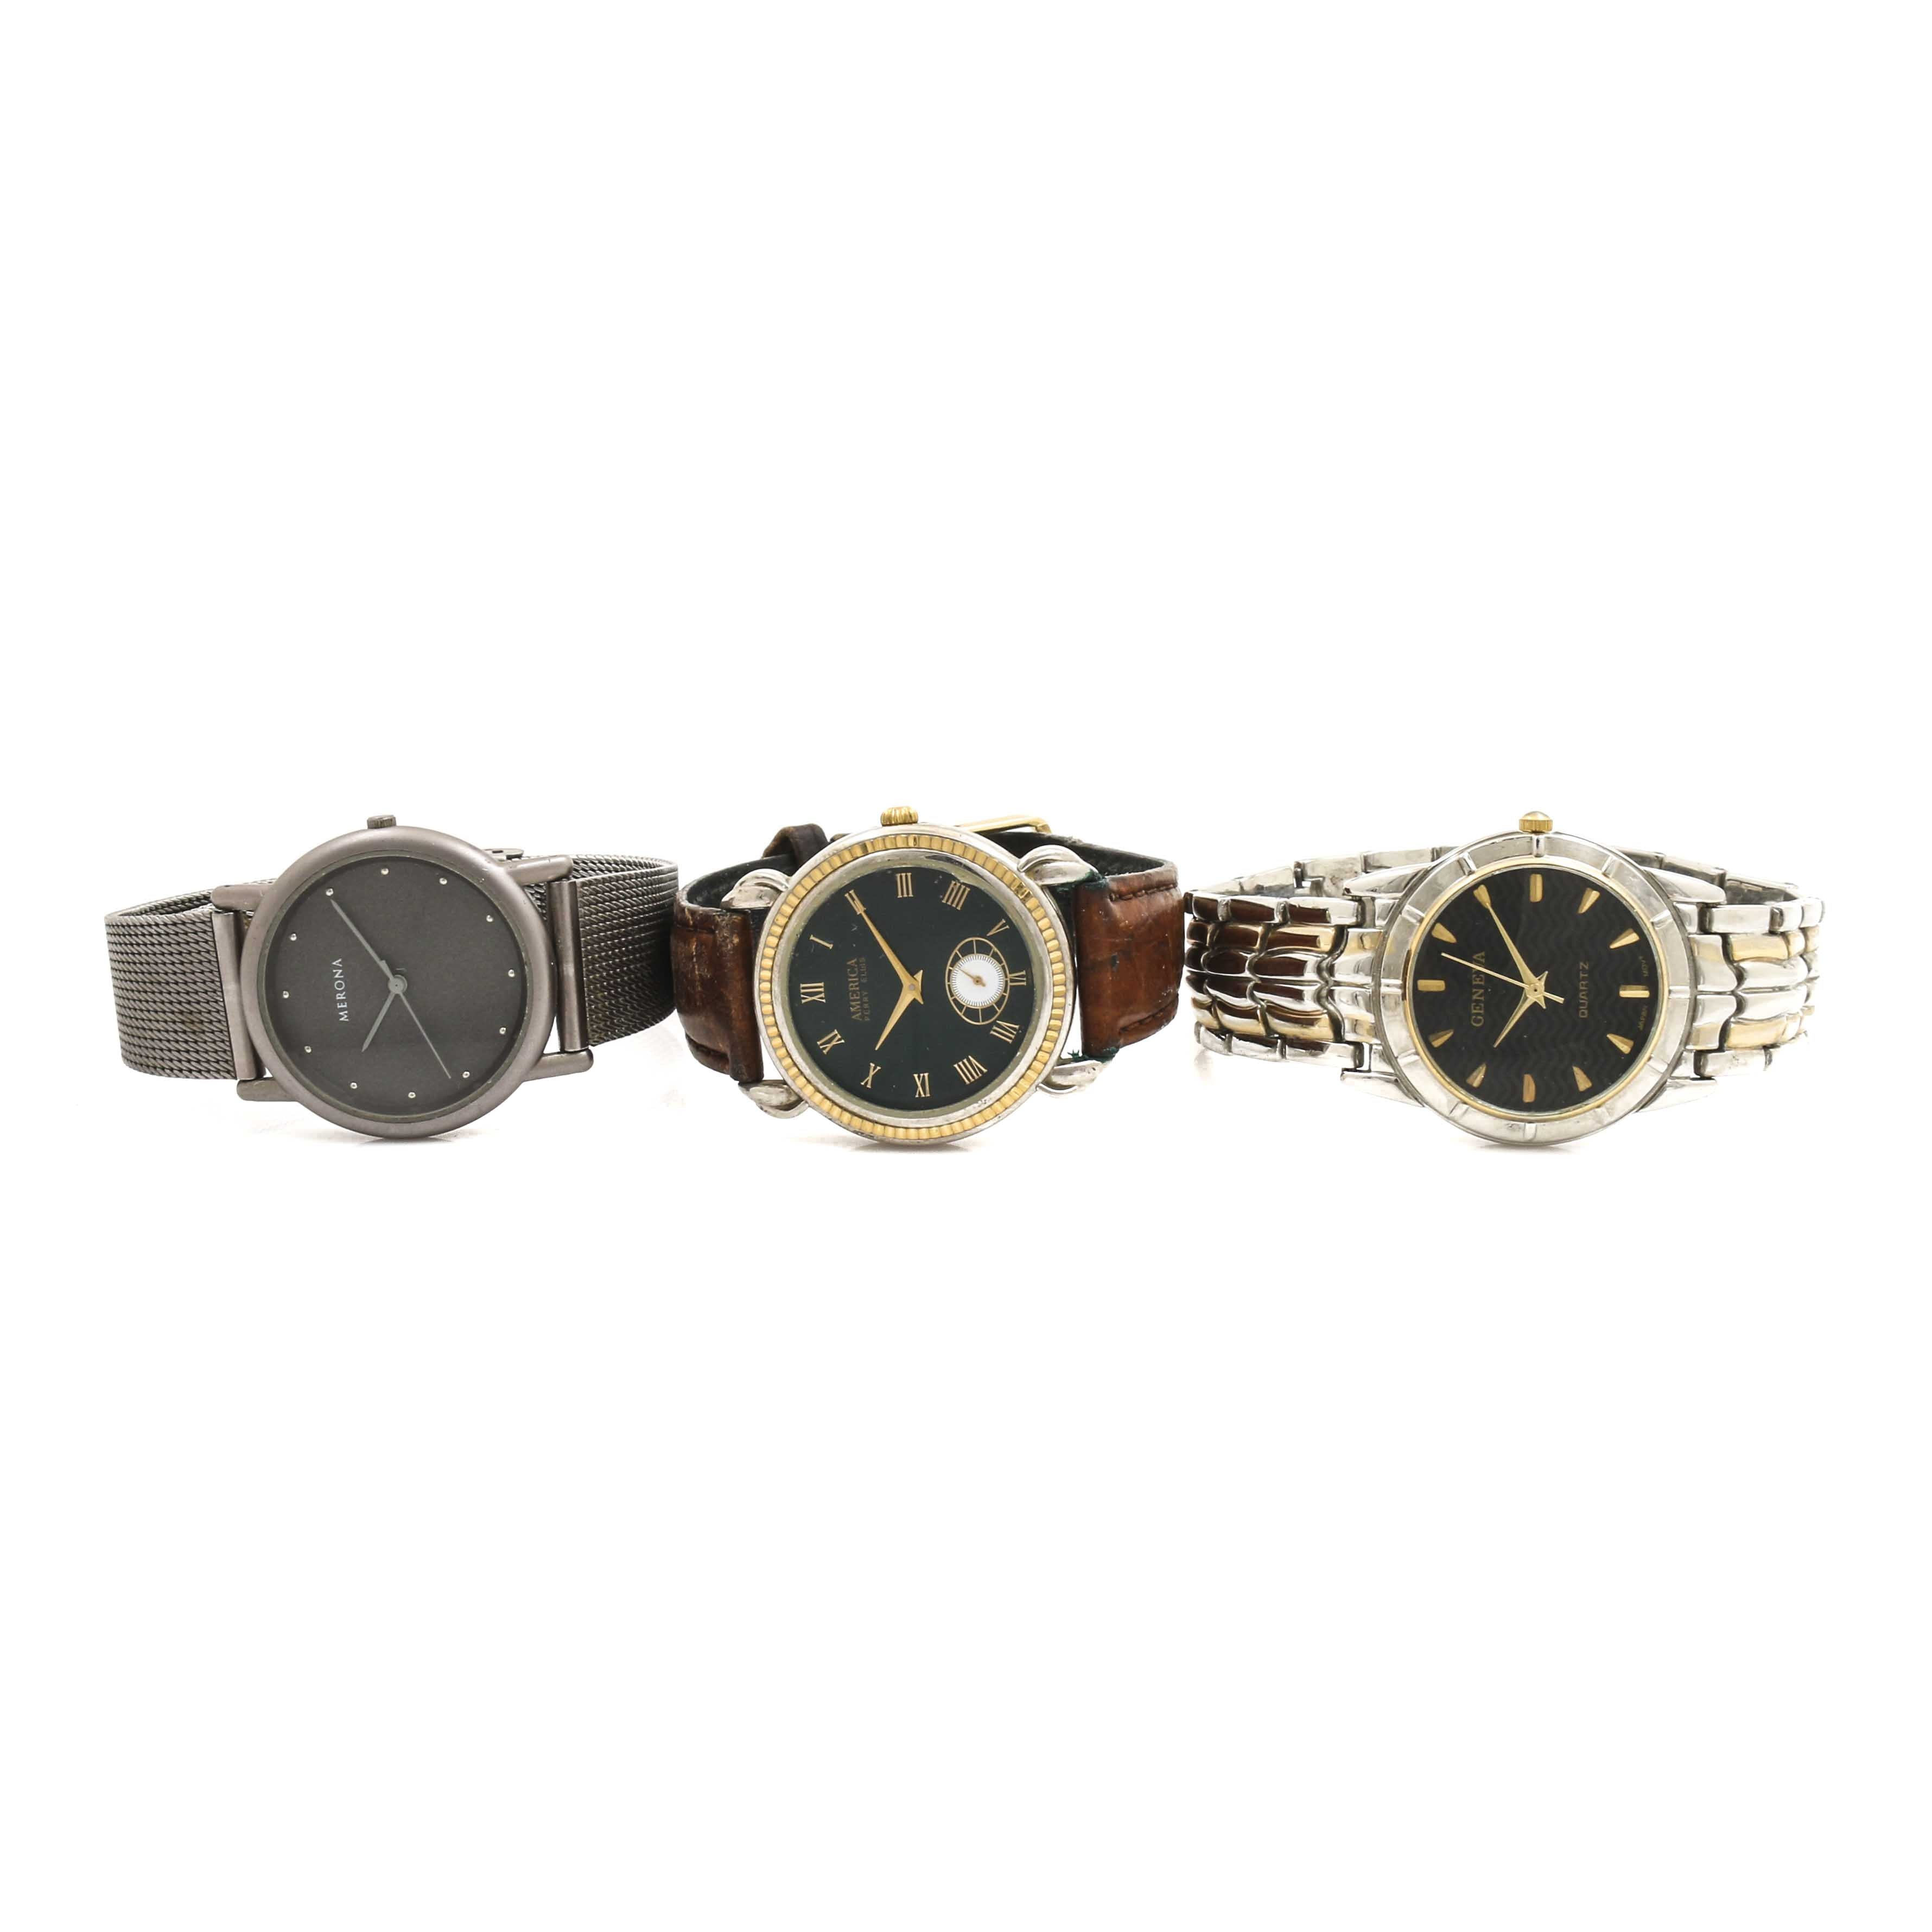 Three Analog Wristwatches